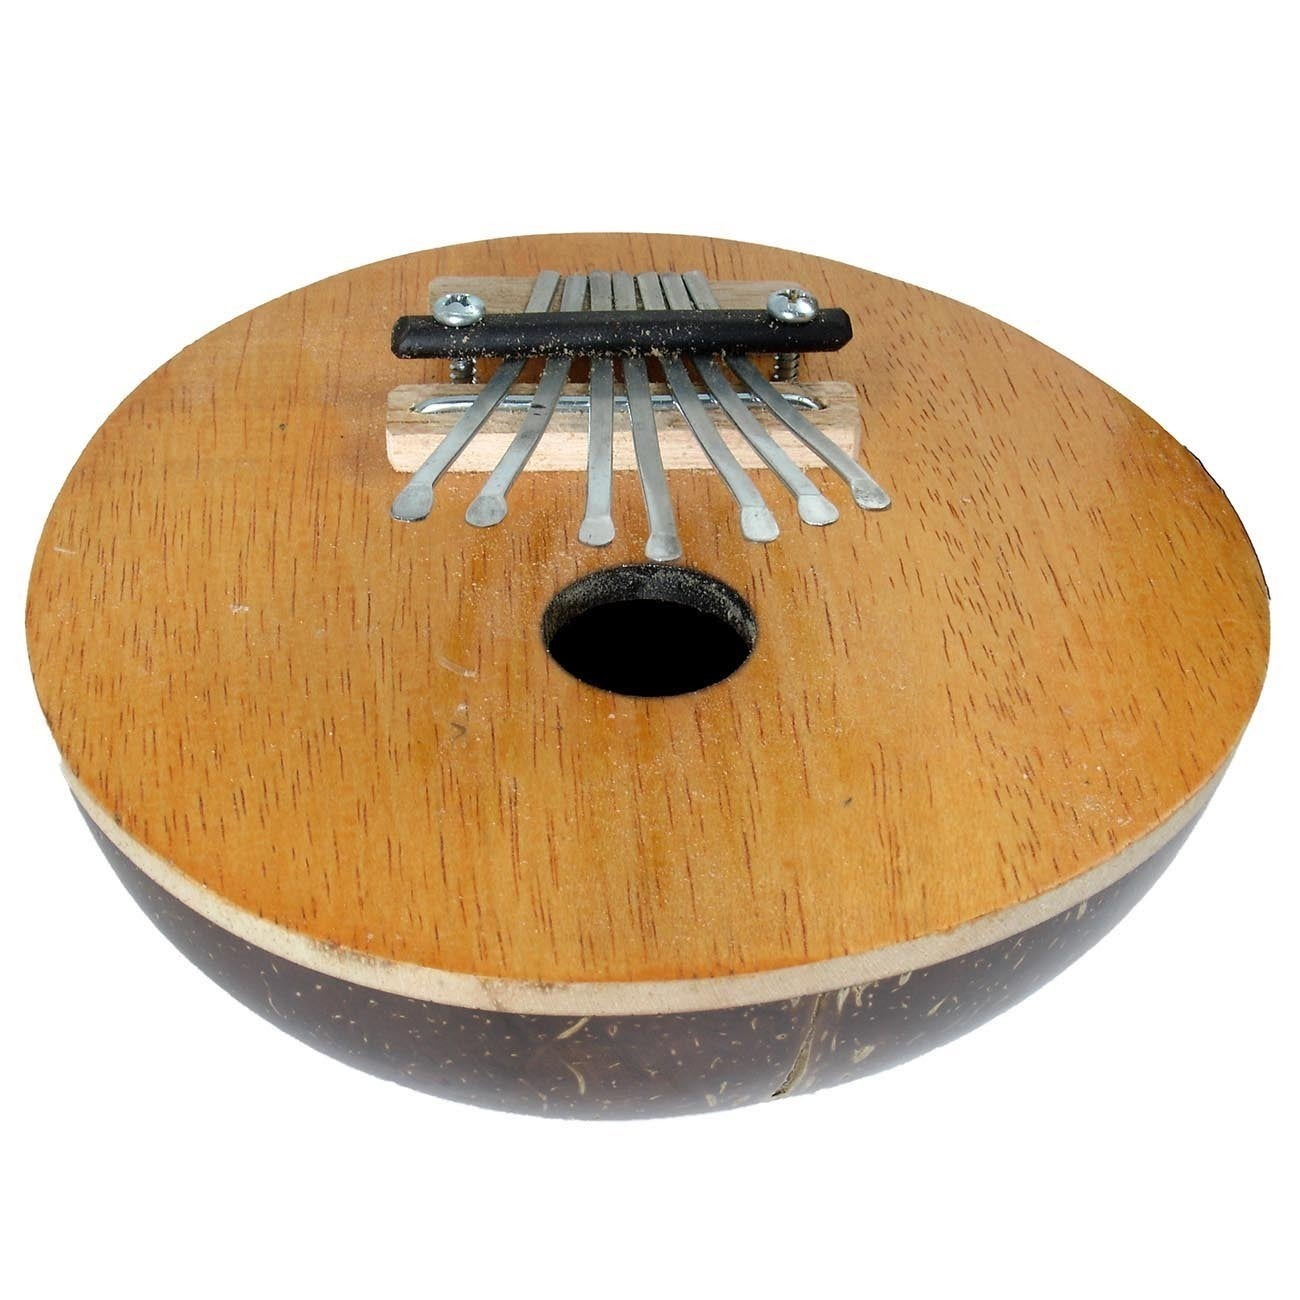 Handmade Fair Trade Handmade Wood & Coconut Shell Thumb Piano (Indonesia)